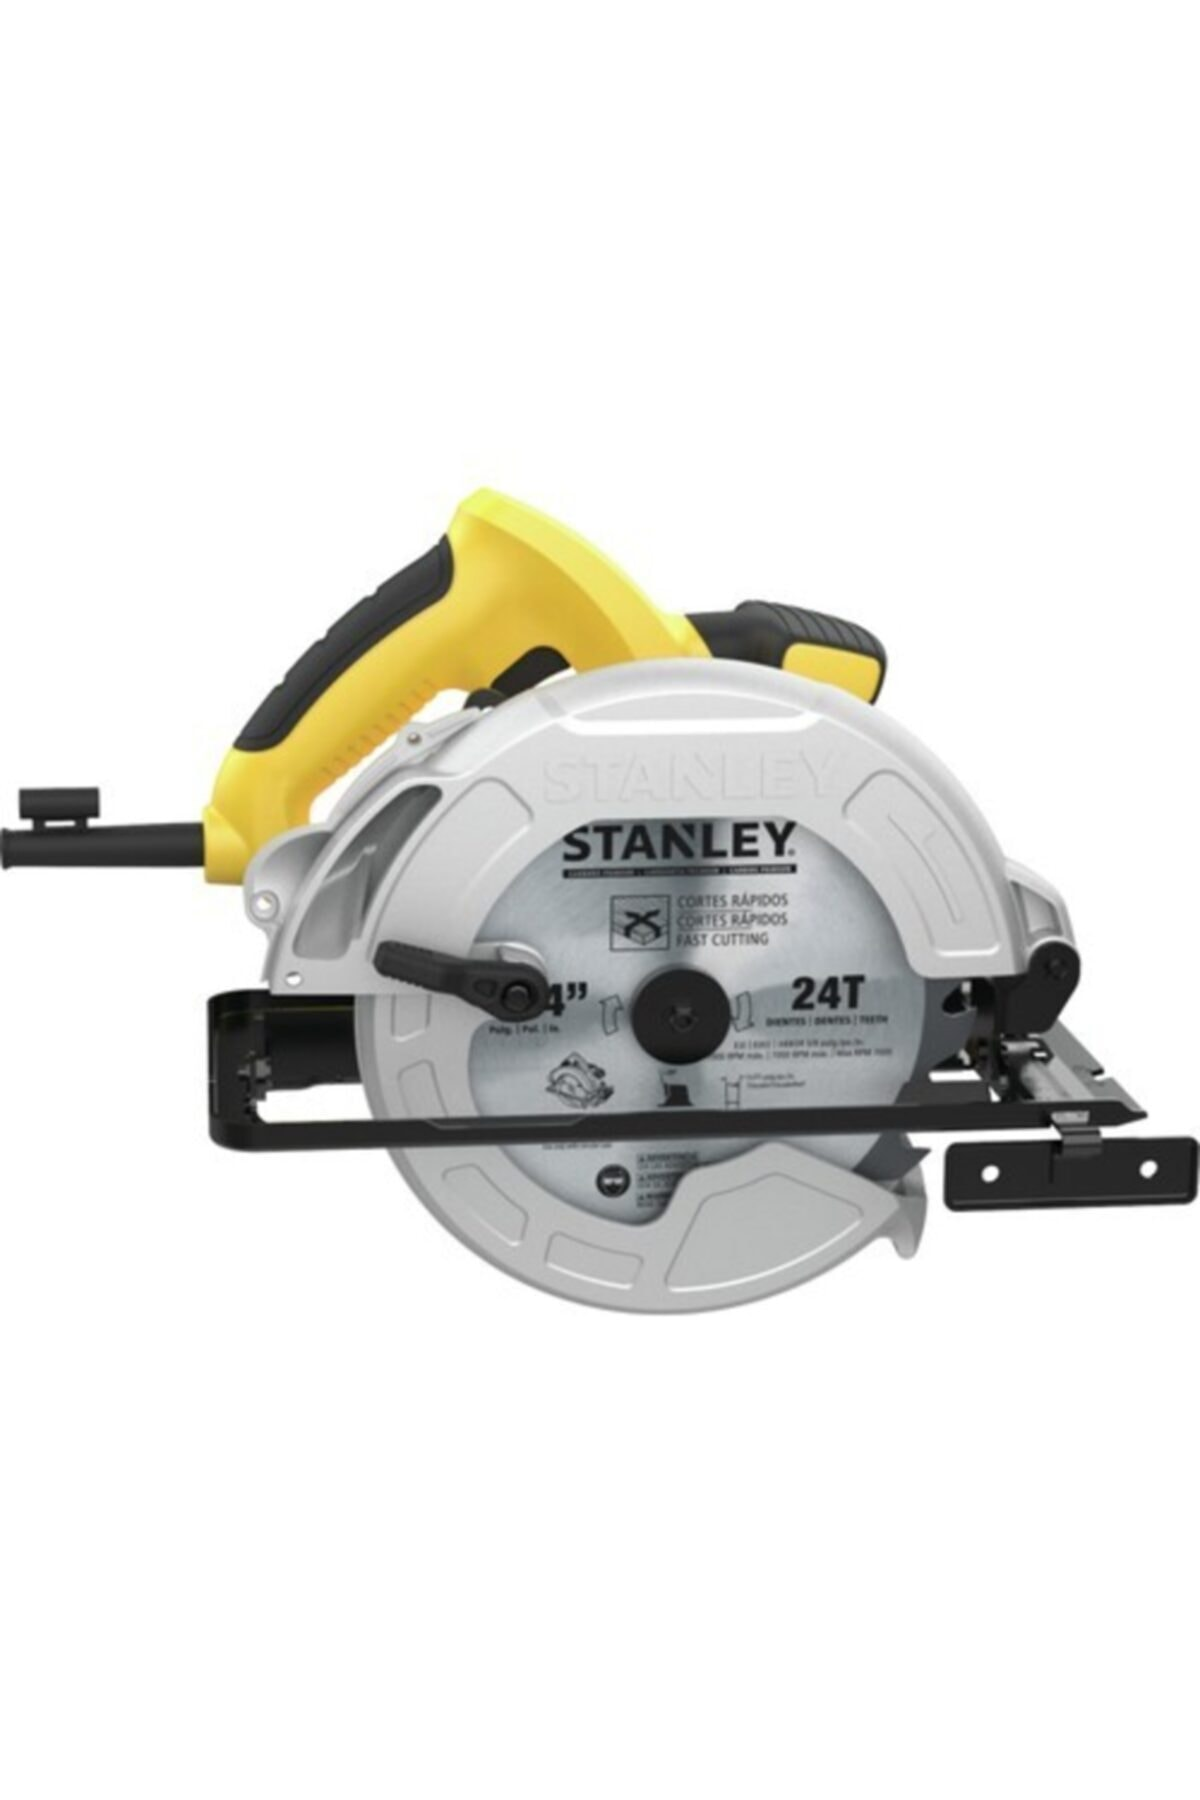 Stanley Sc16 1600w 190mm Daire Testere Makinesi 1